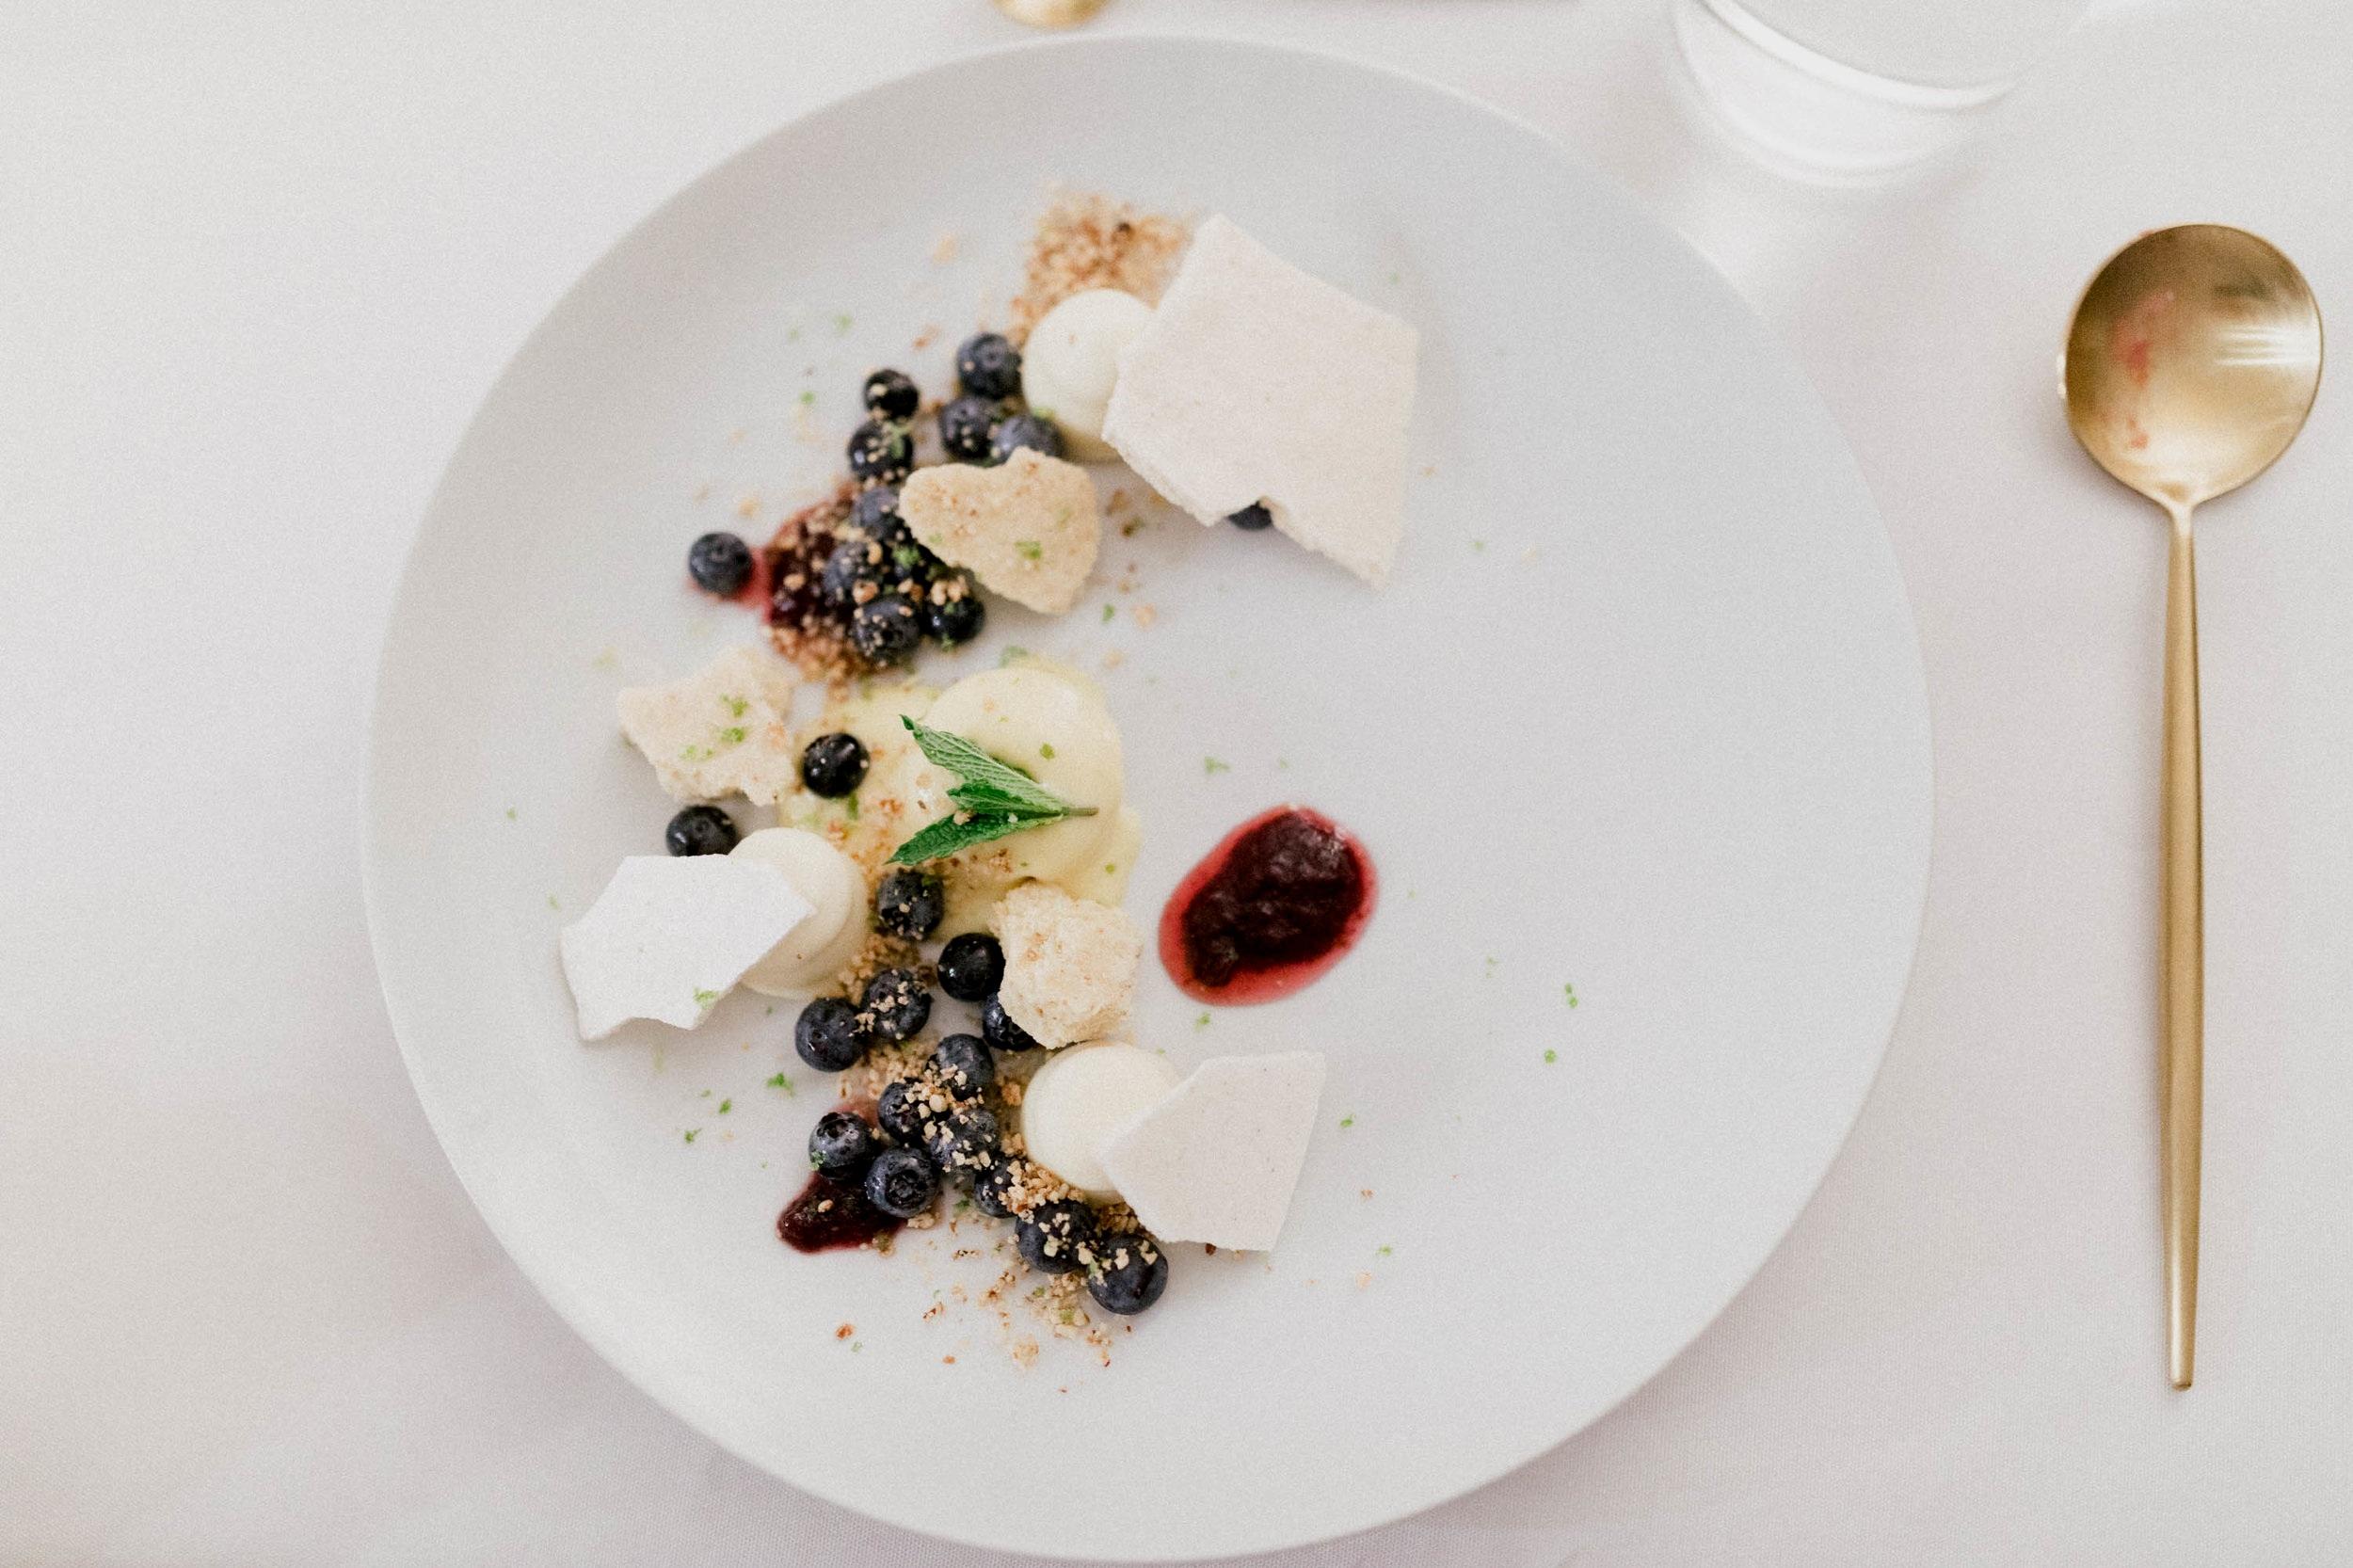 Taste Series: Sour - 3.16.19